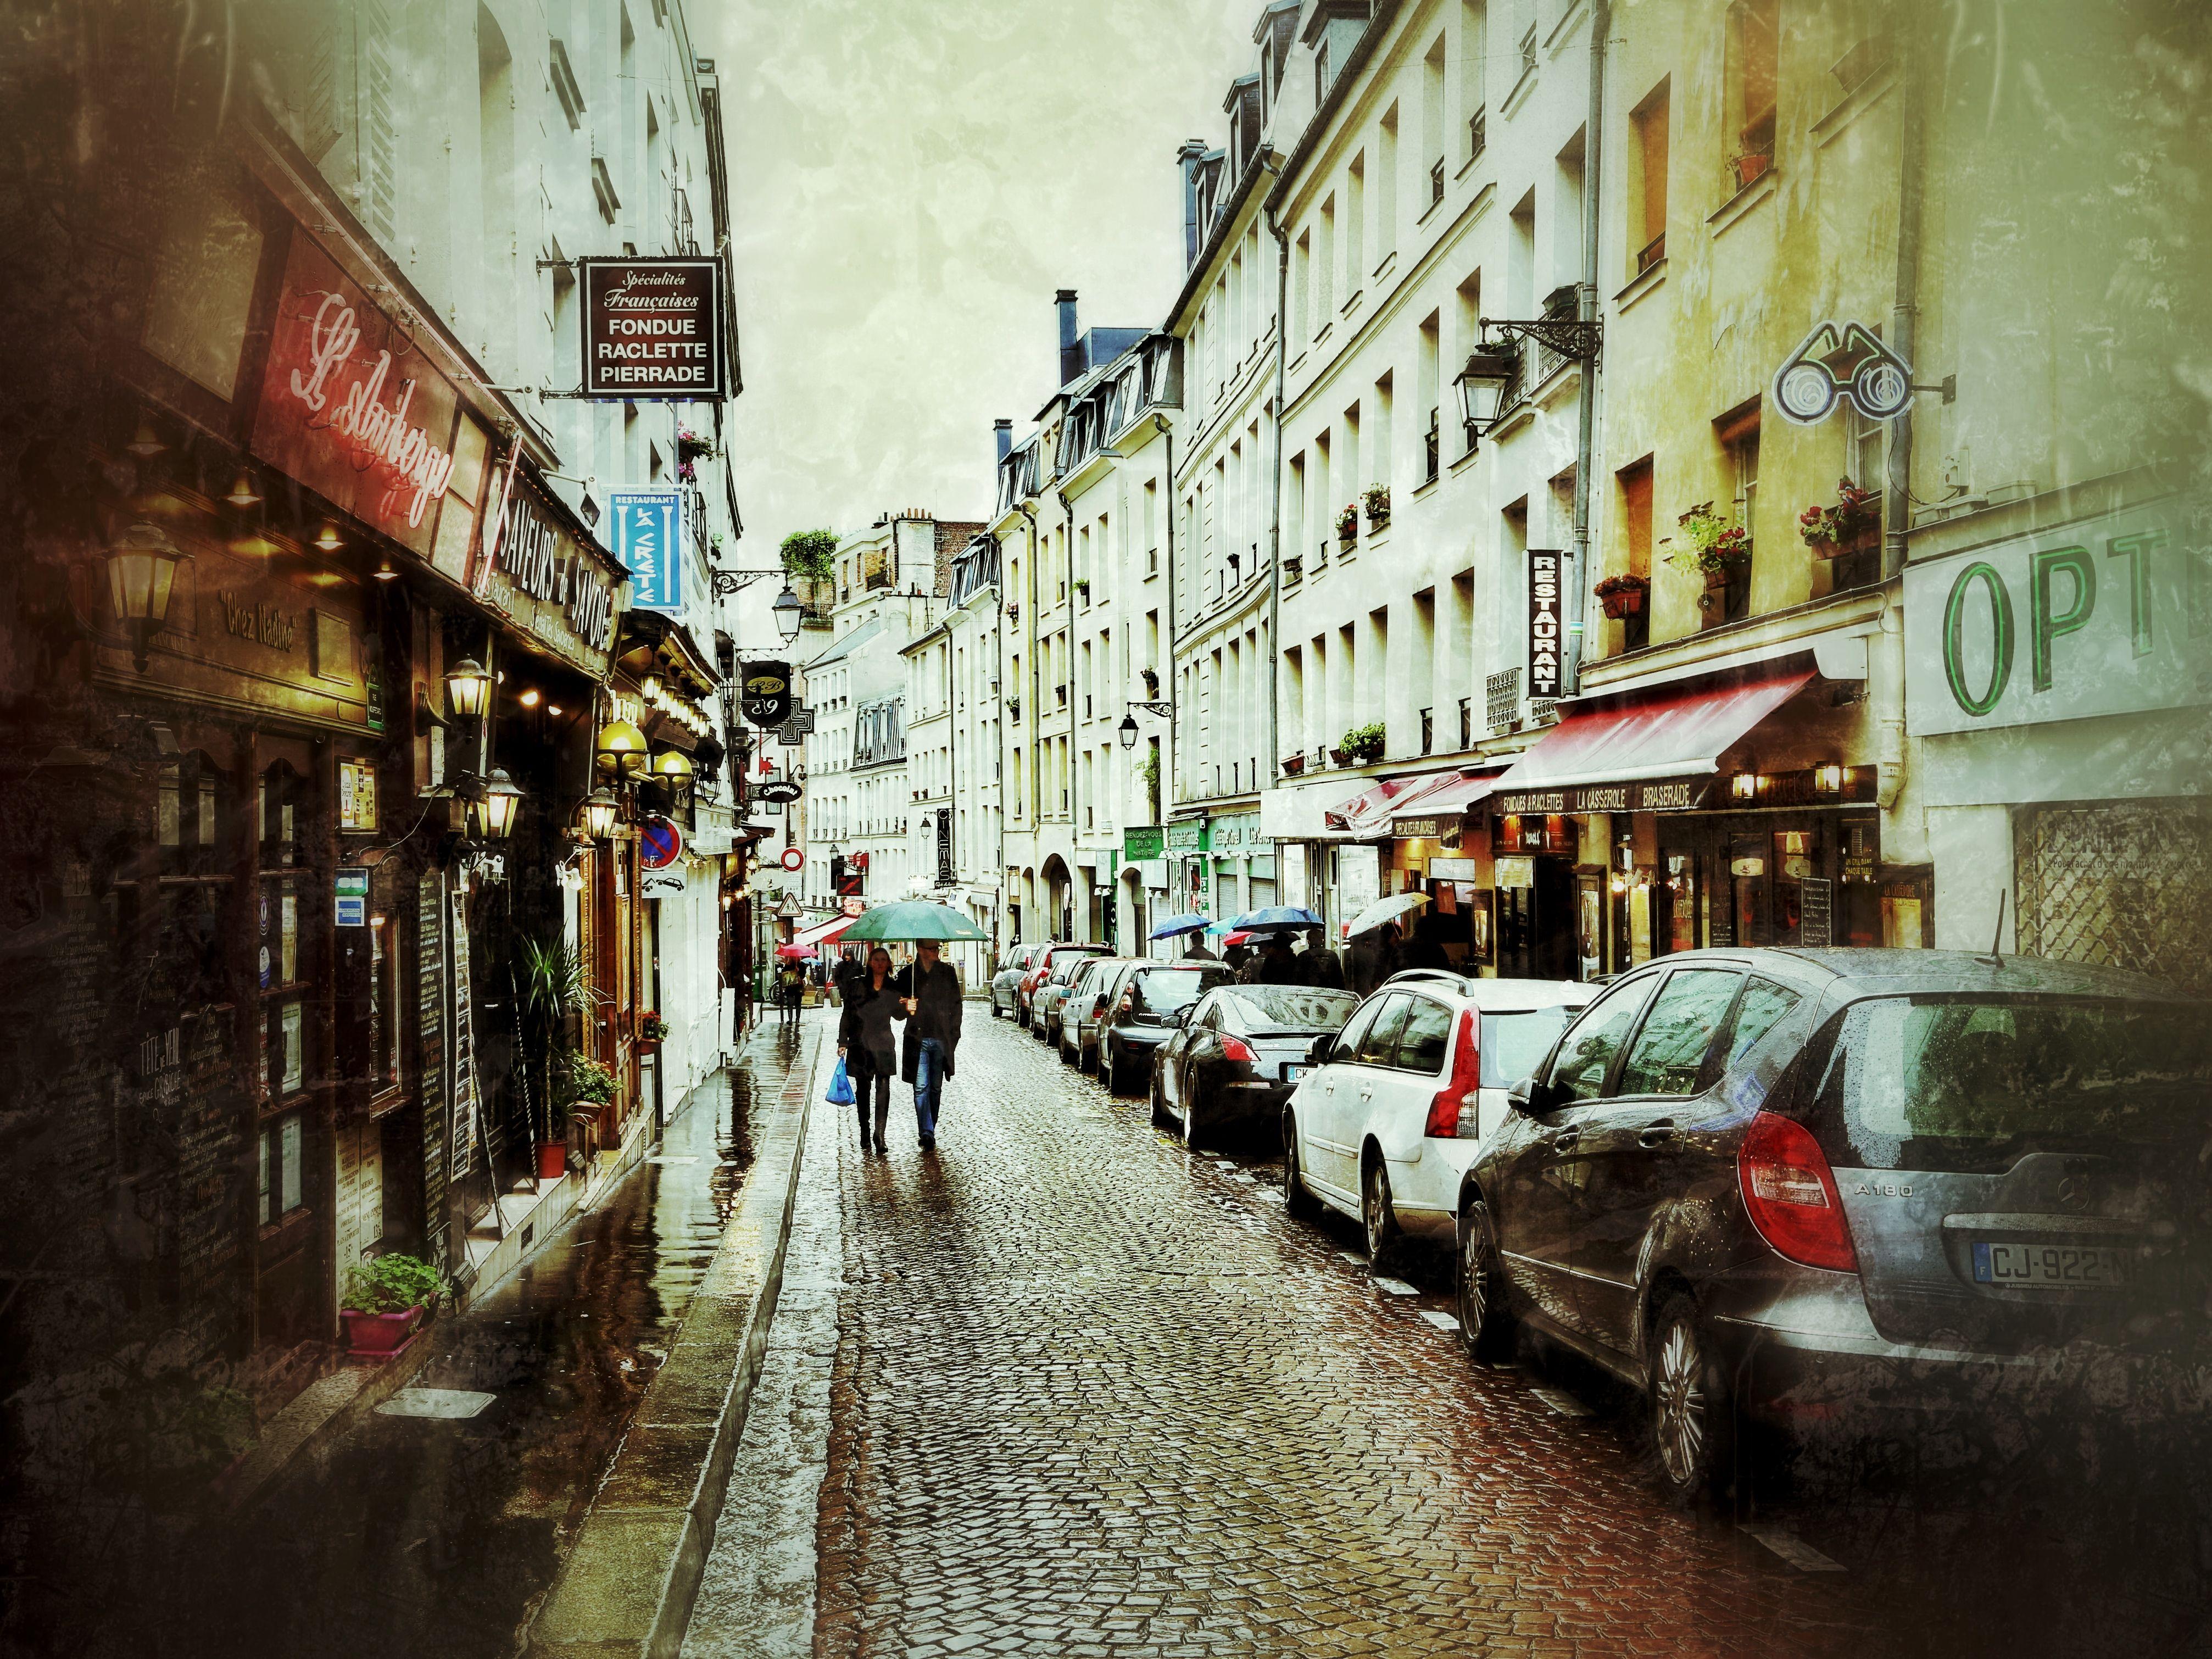 Paris Street Cafe Wallpaper Streets of paris | STREETS ...